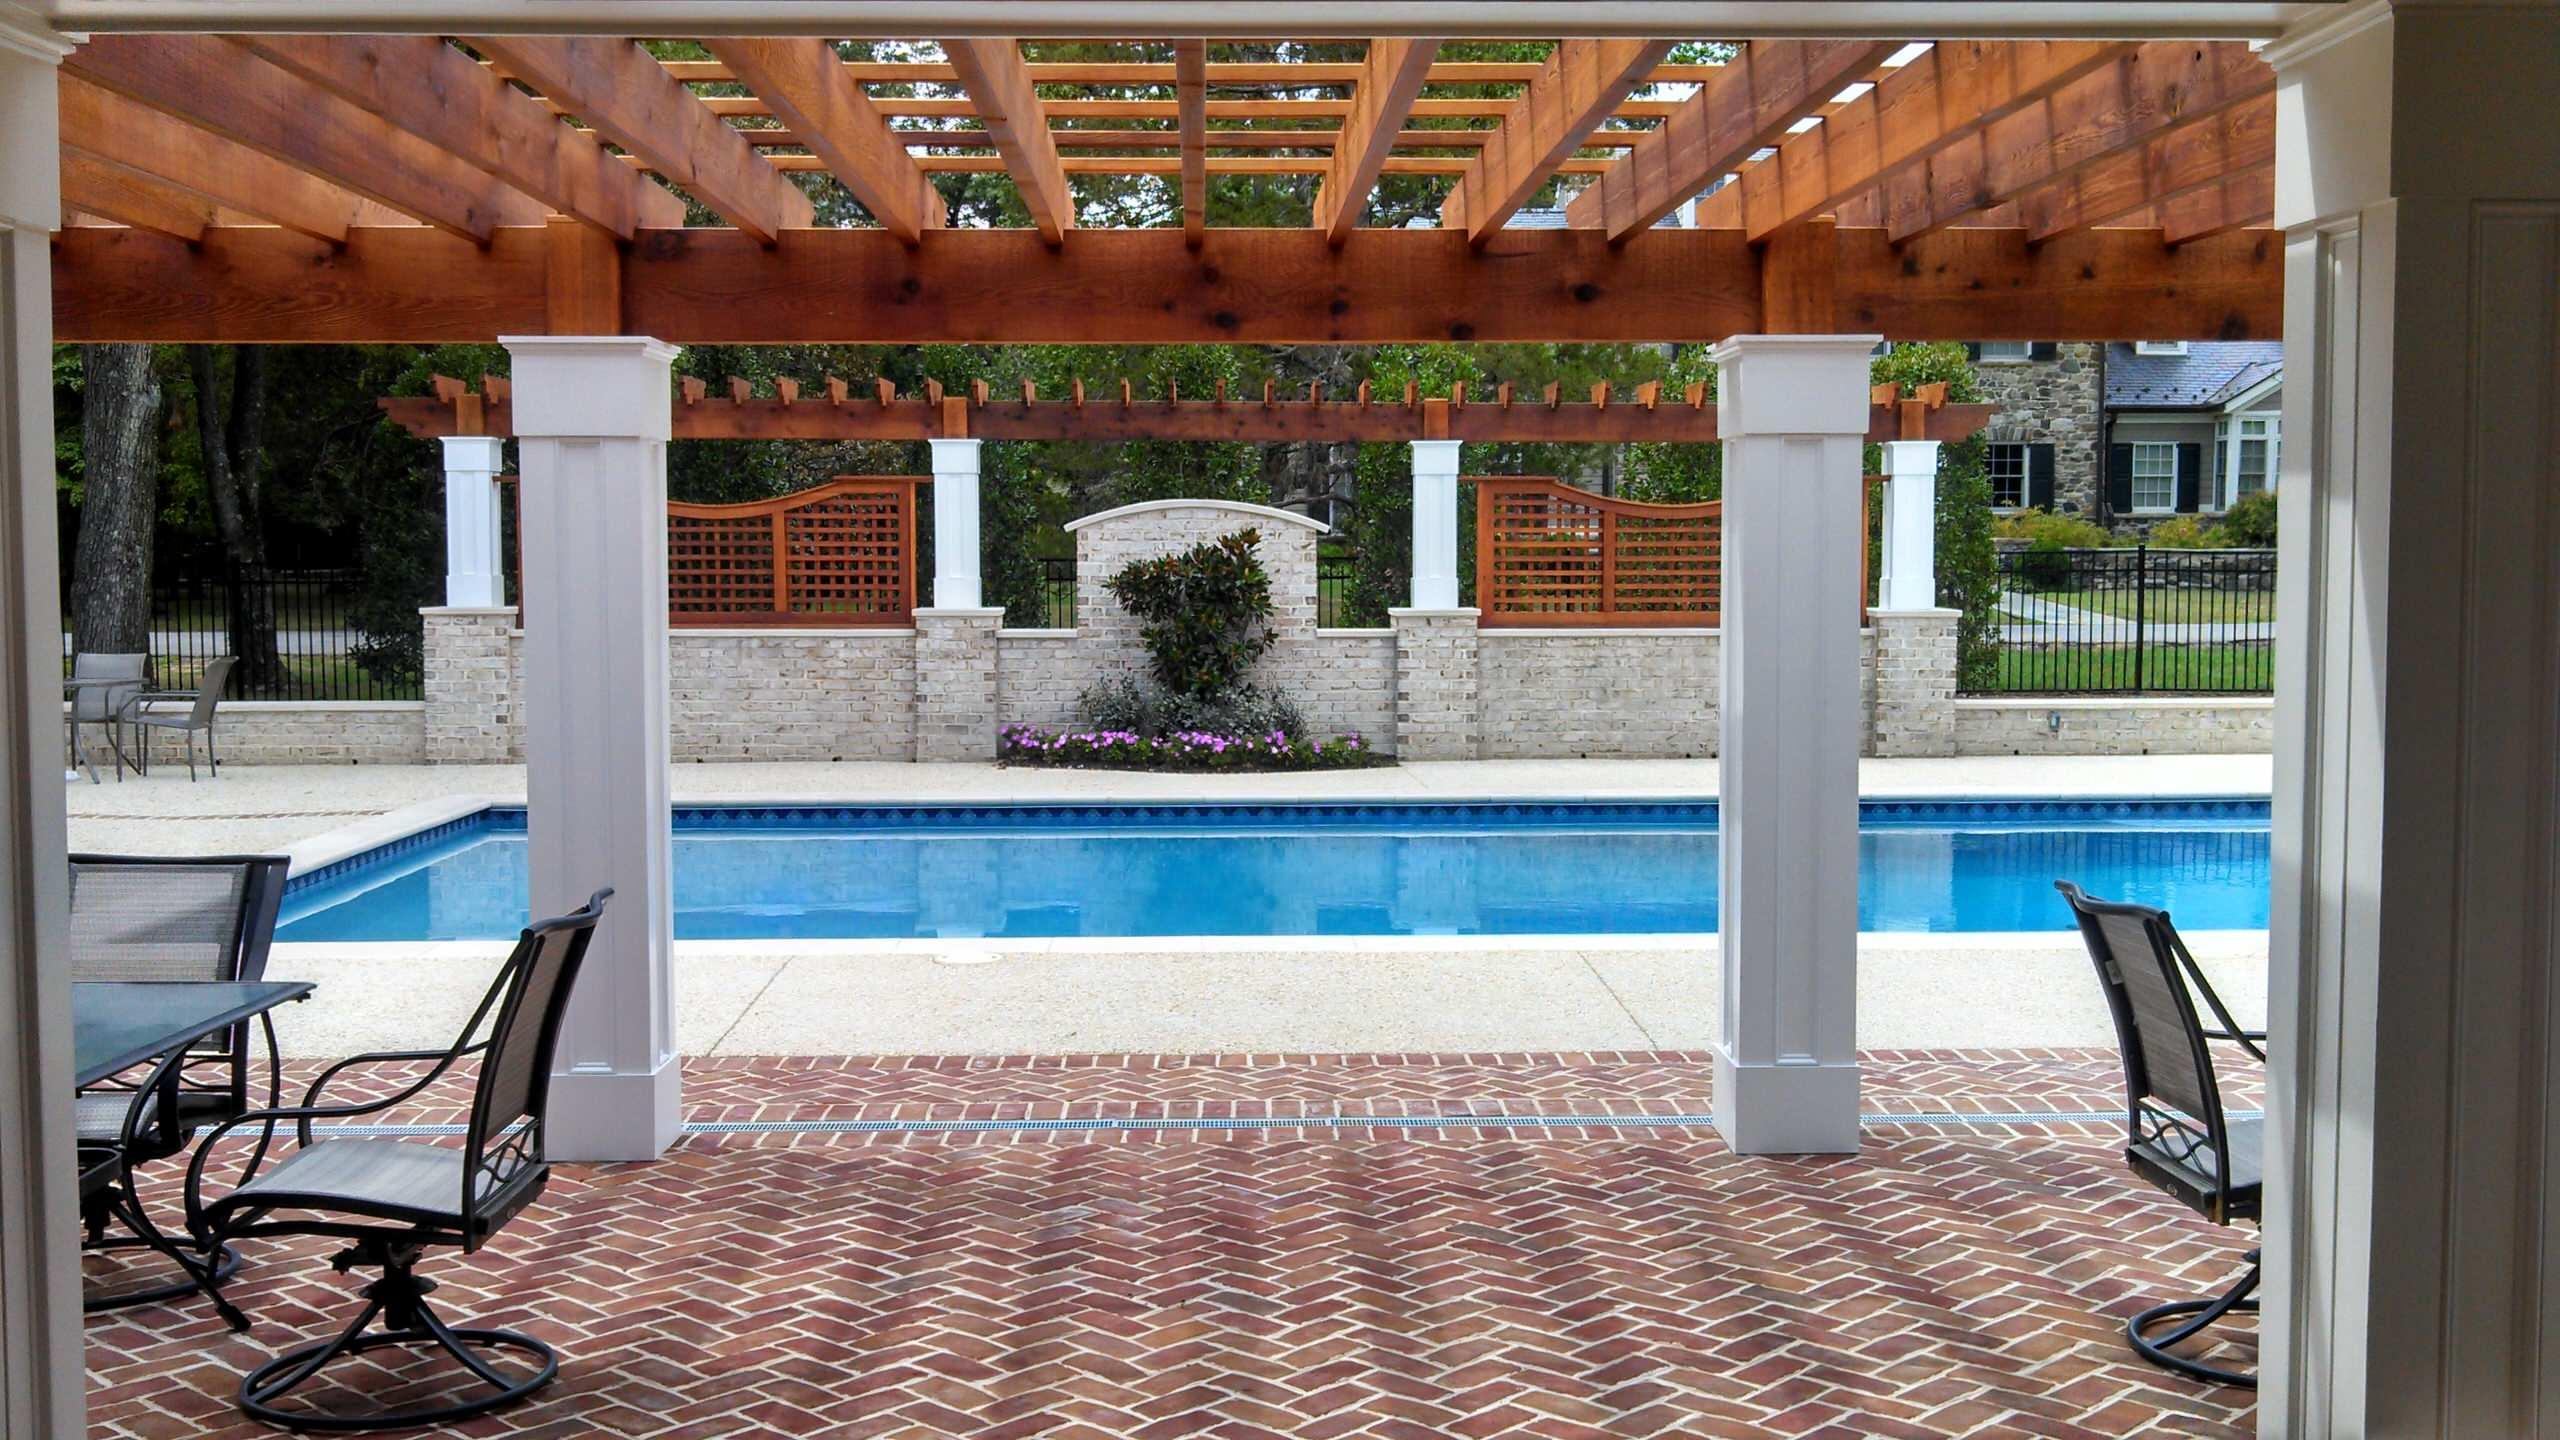 Alexandria - Pool & Pool House Renovation